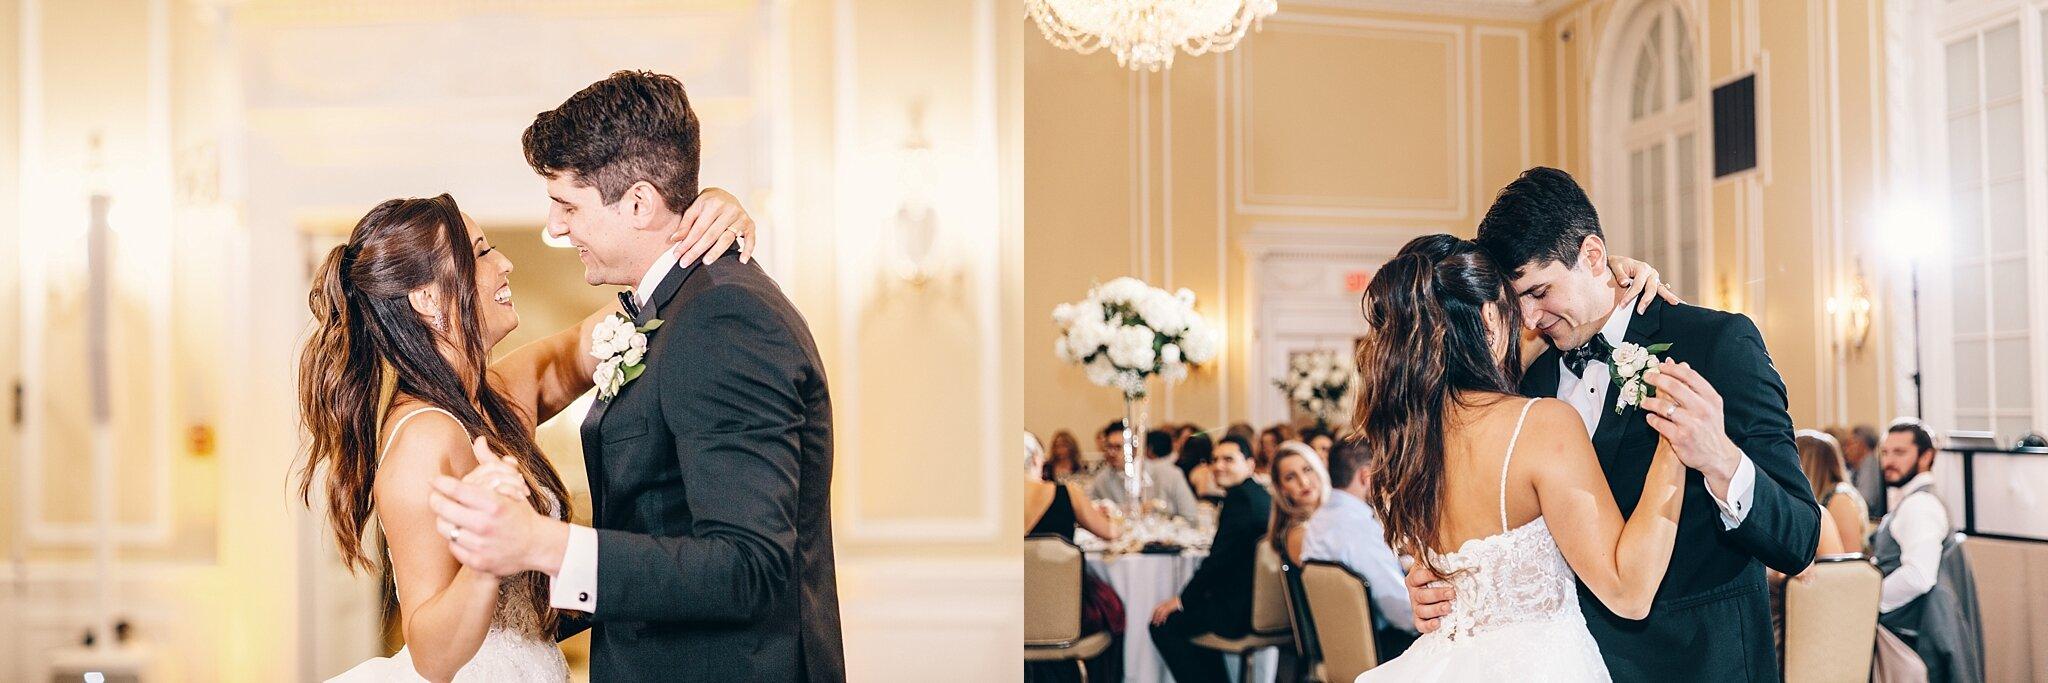 patrick-henry-ballroom-wedding-roanoke_0529.jpg